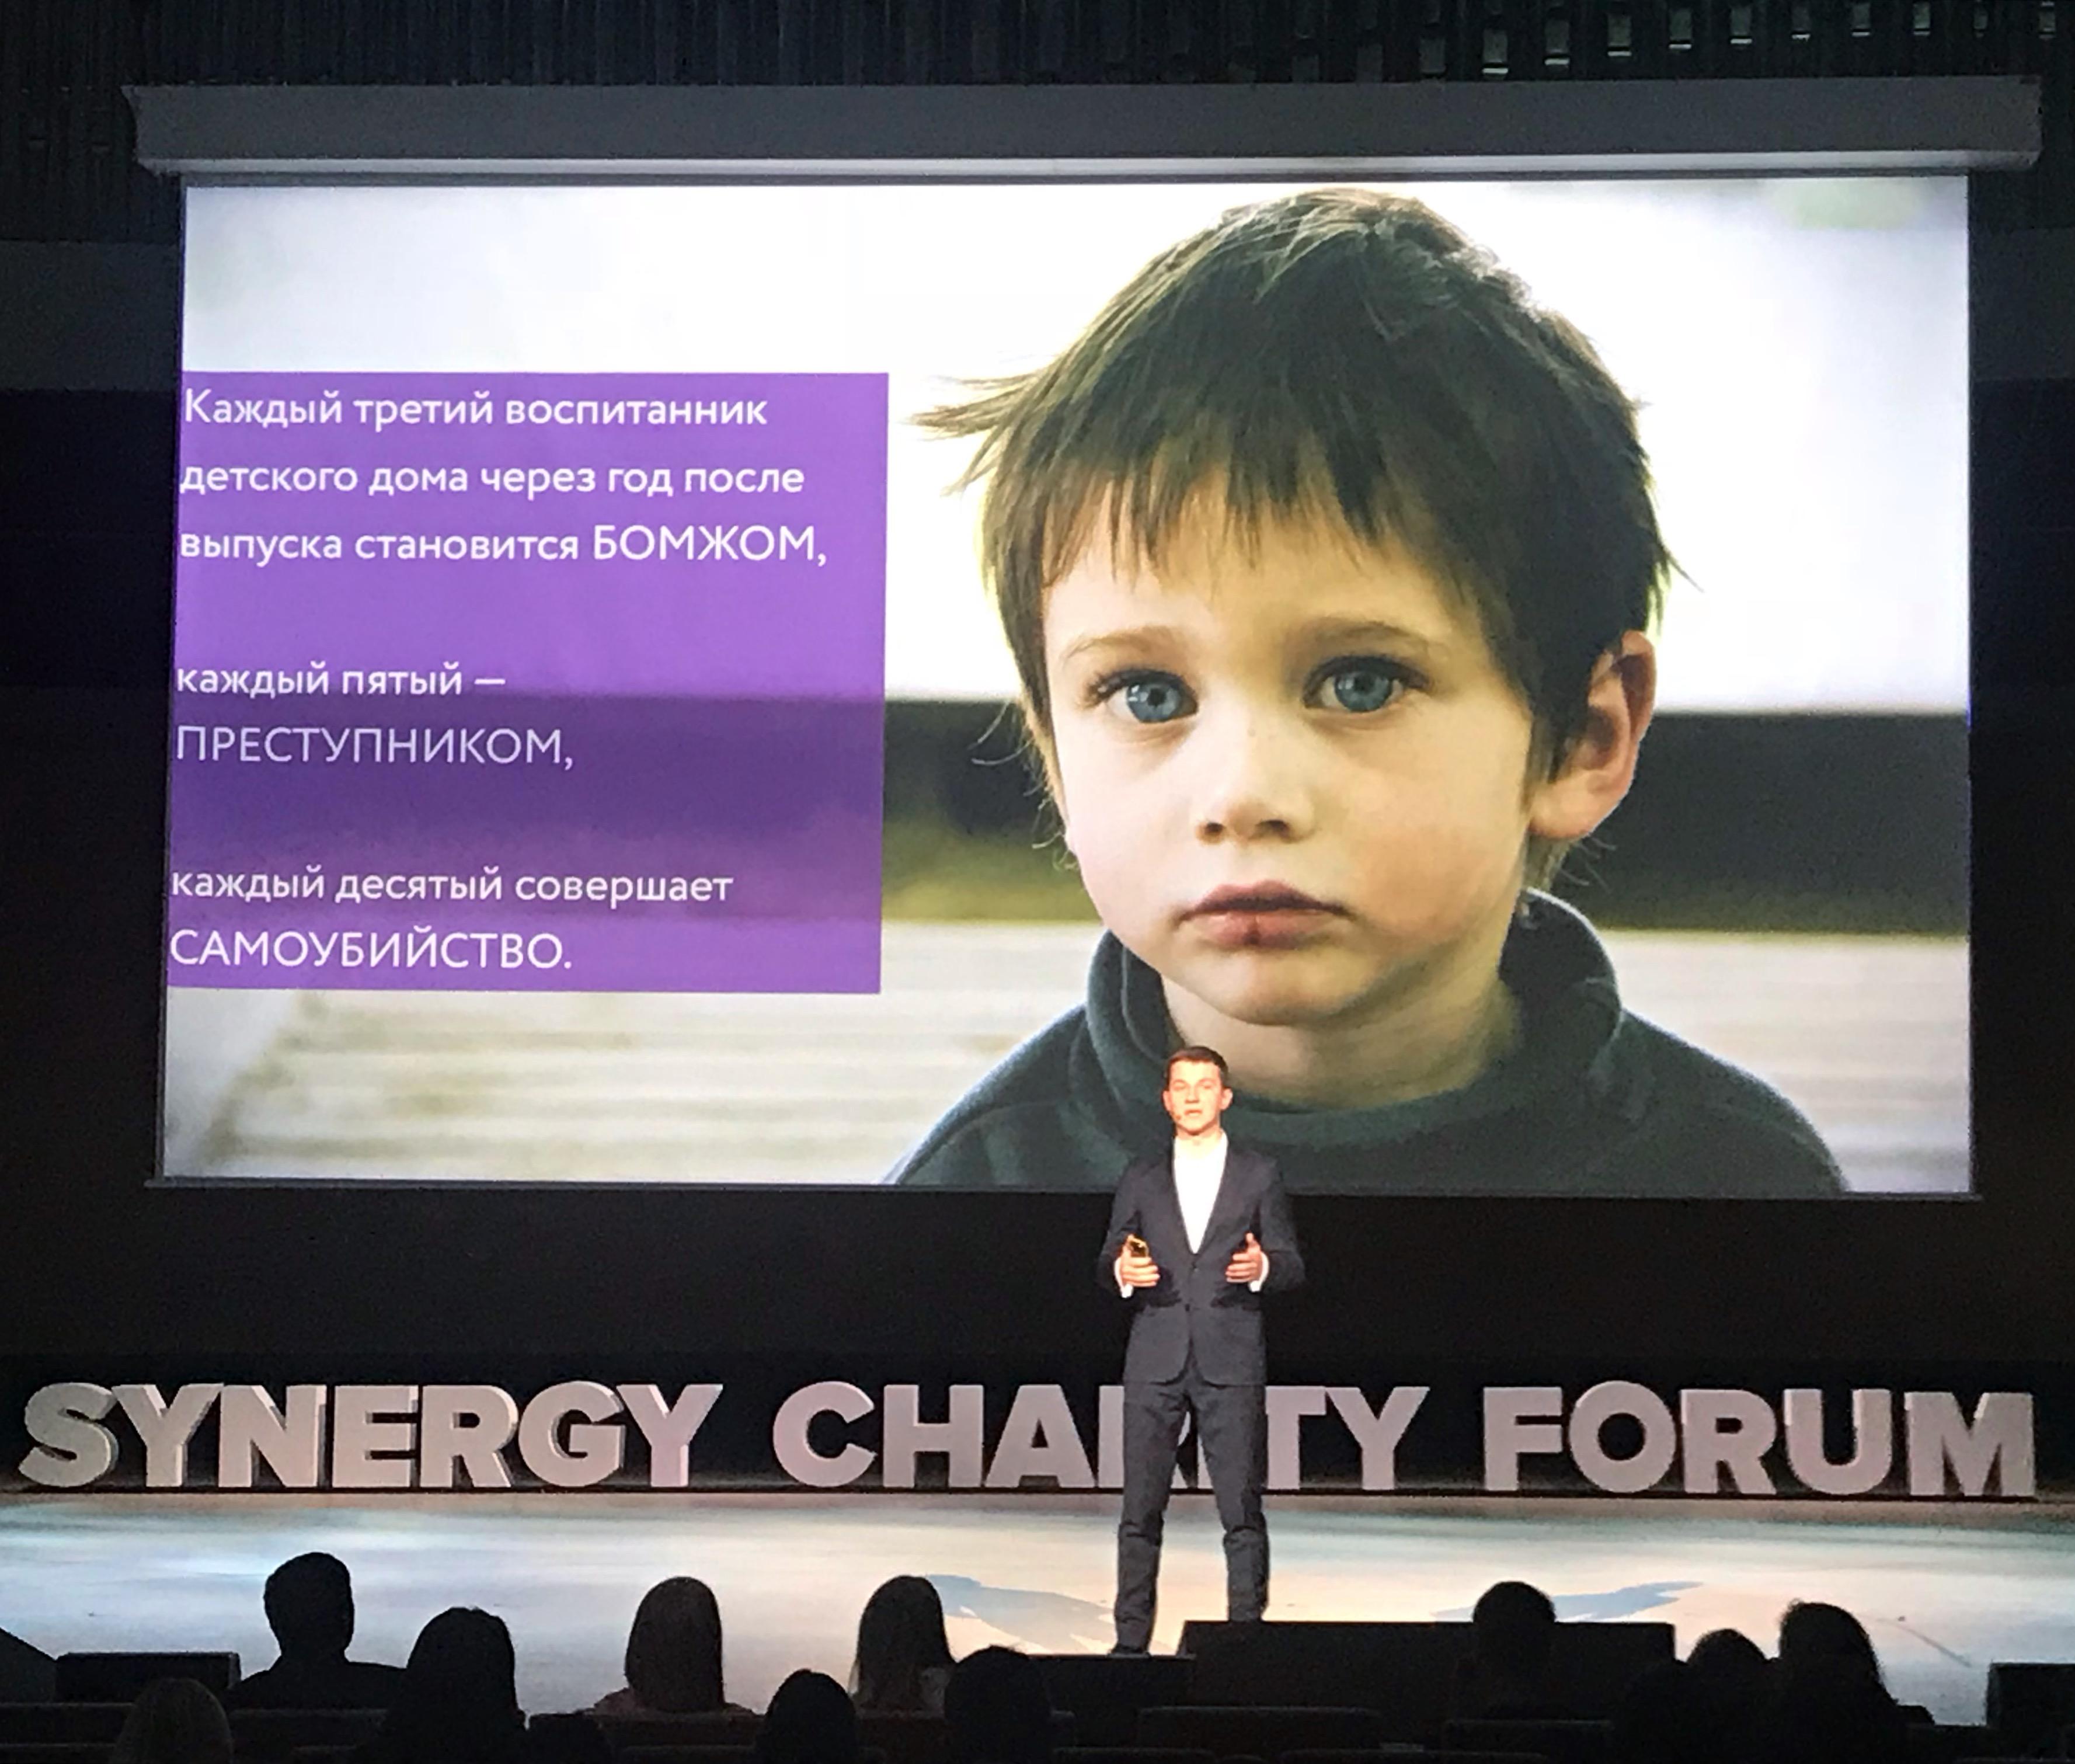 Synergy Charity Forum